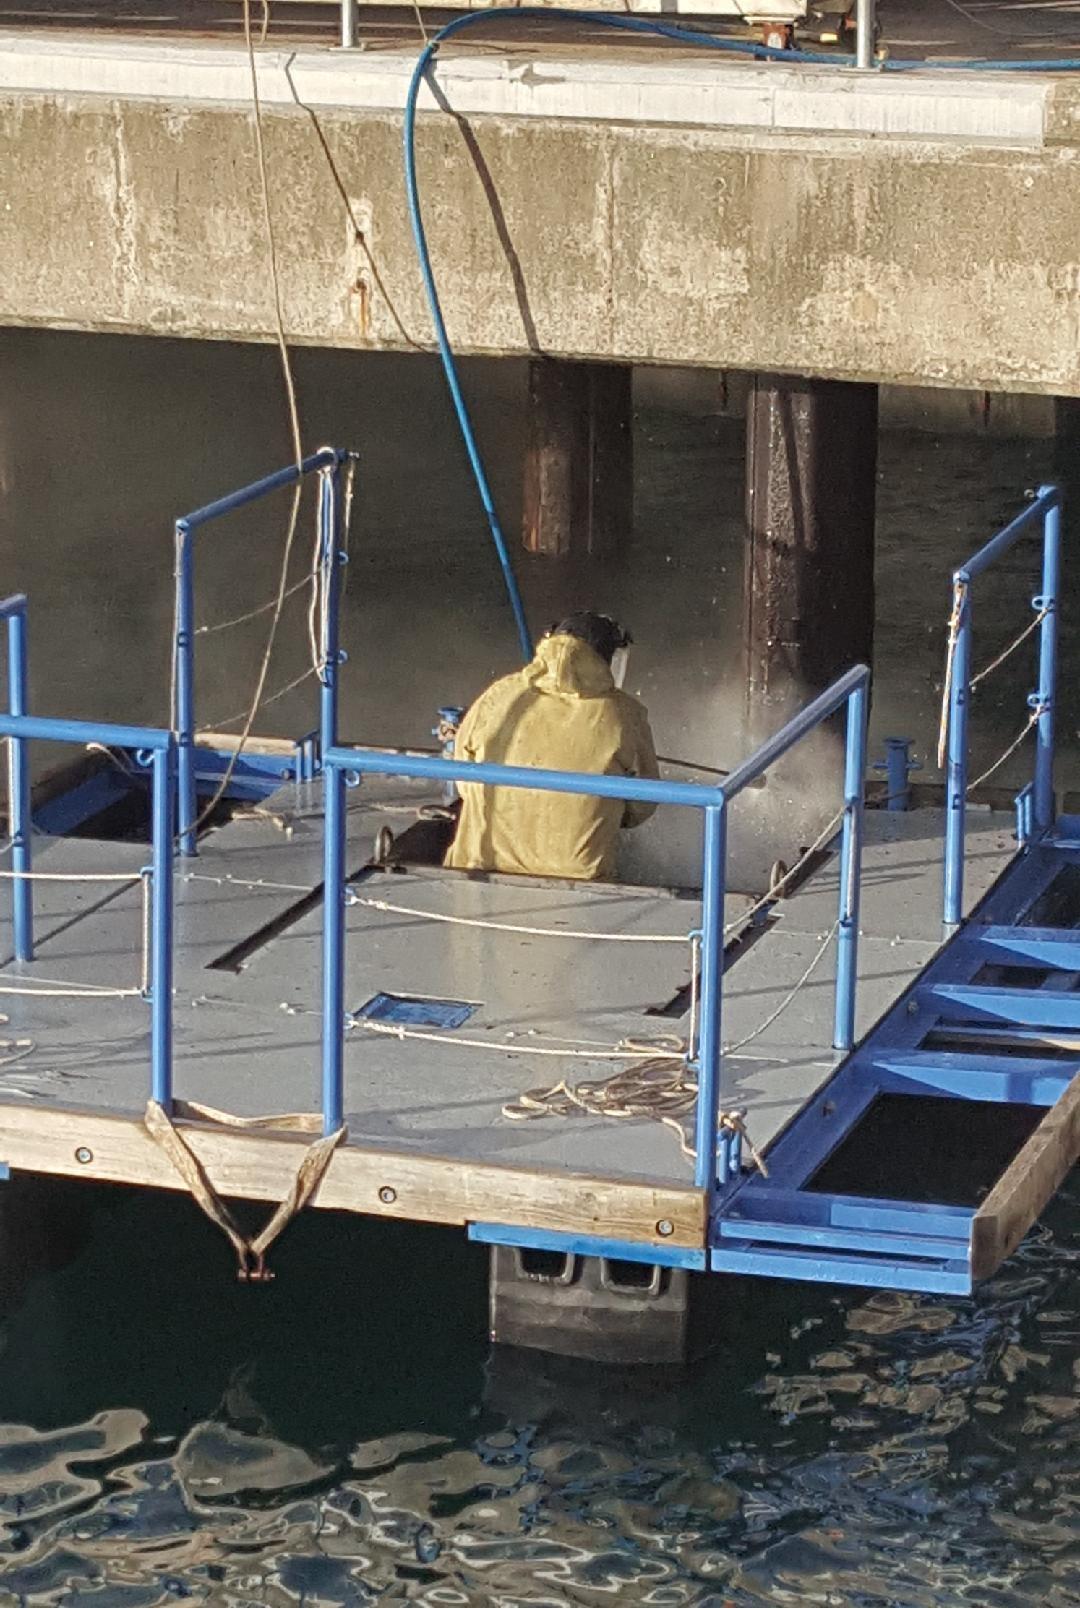 High pressure water blasting at port